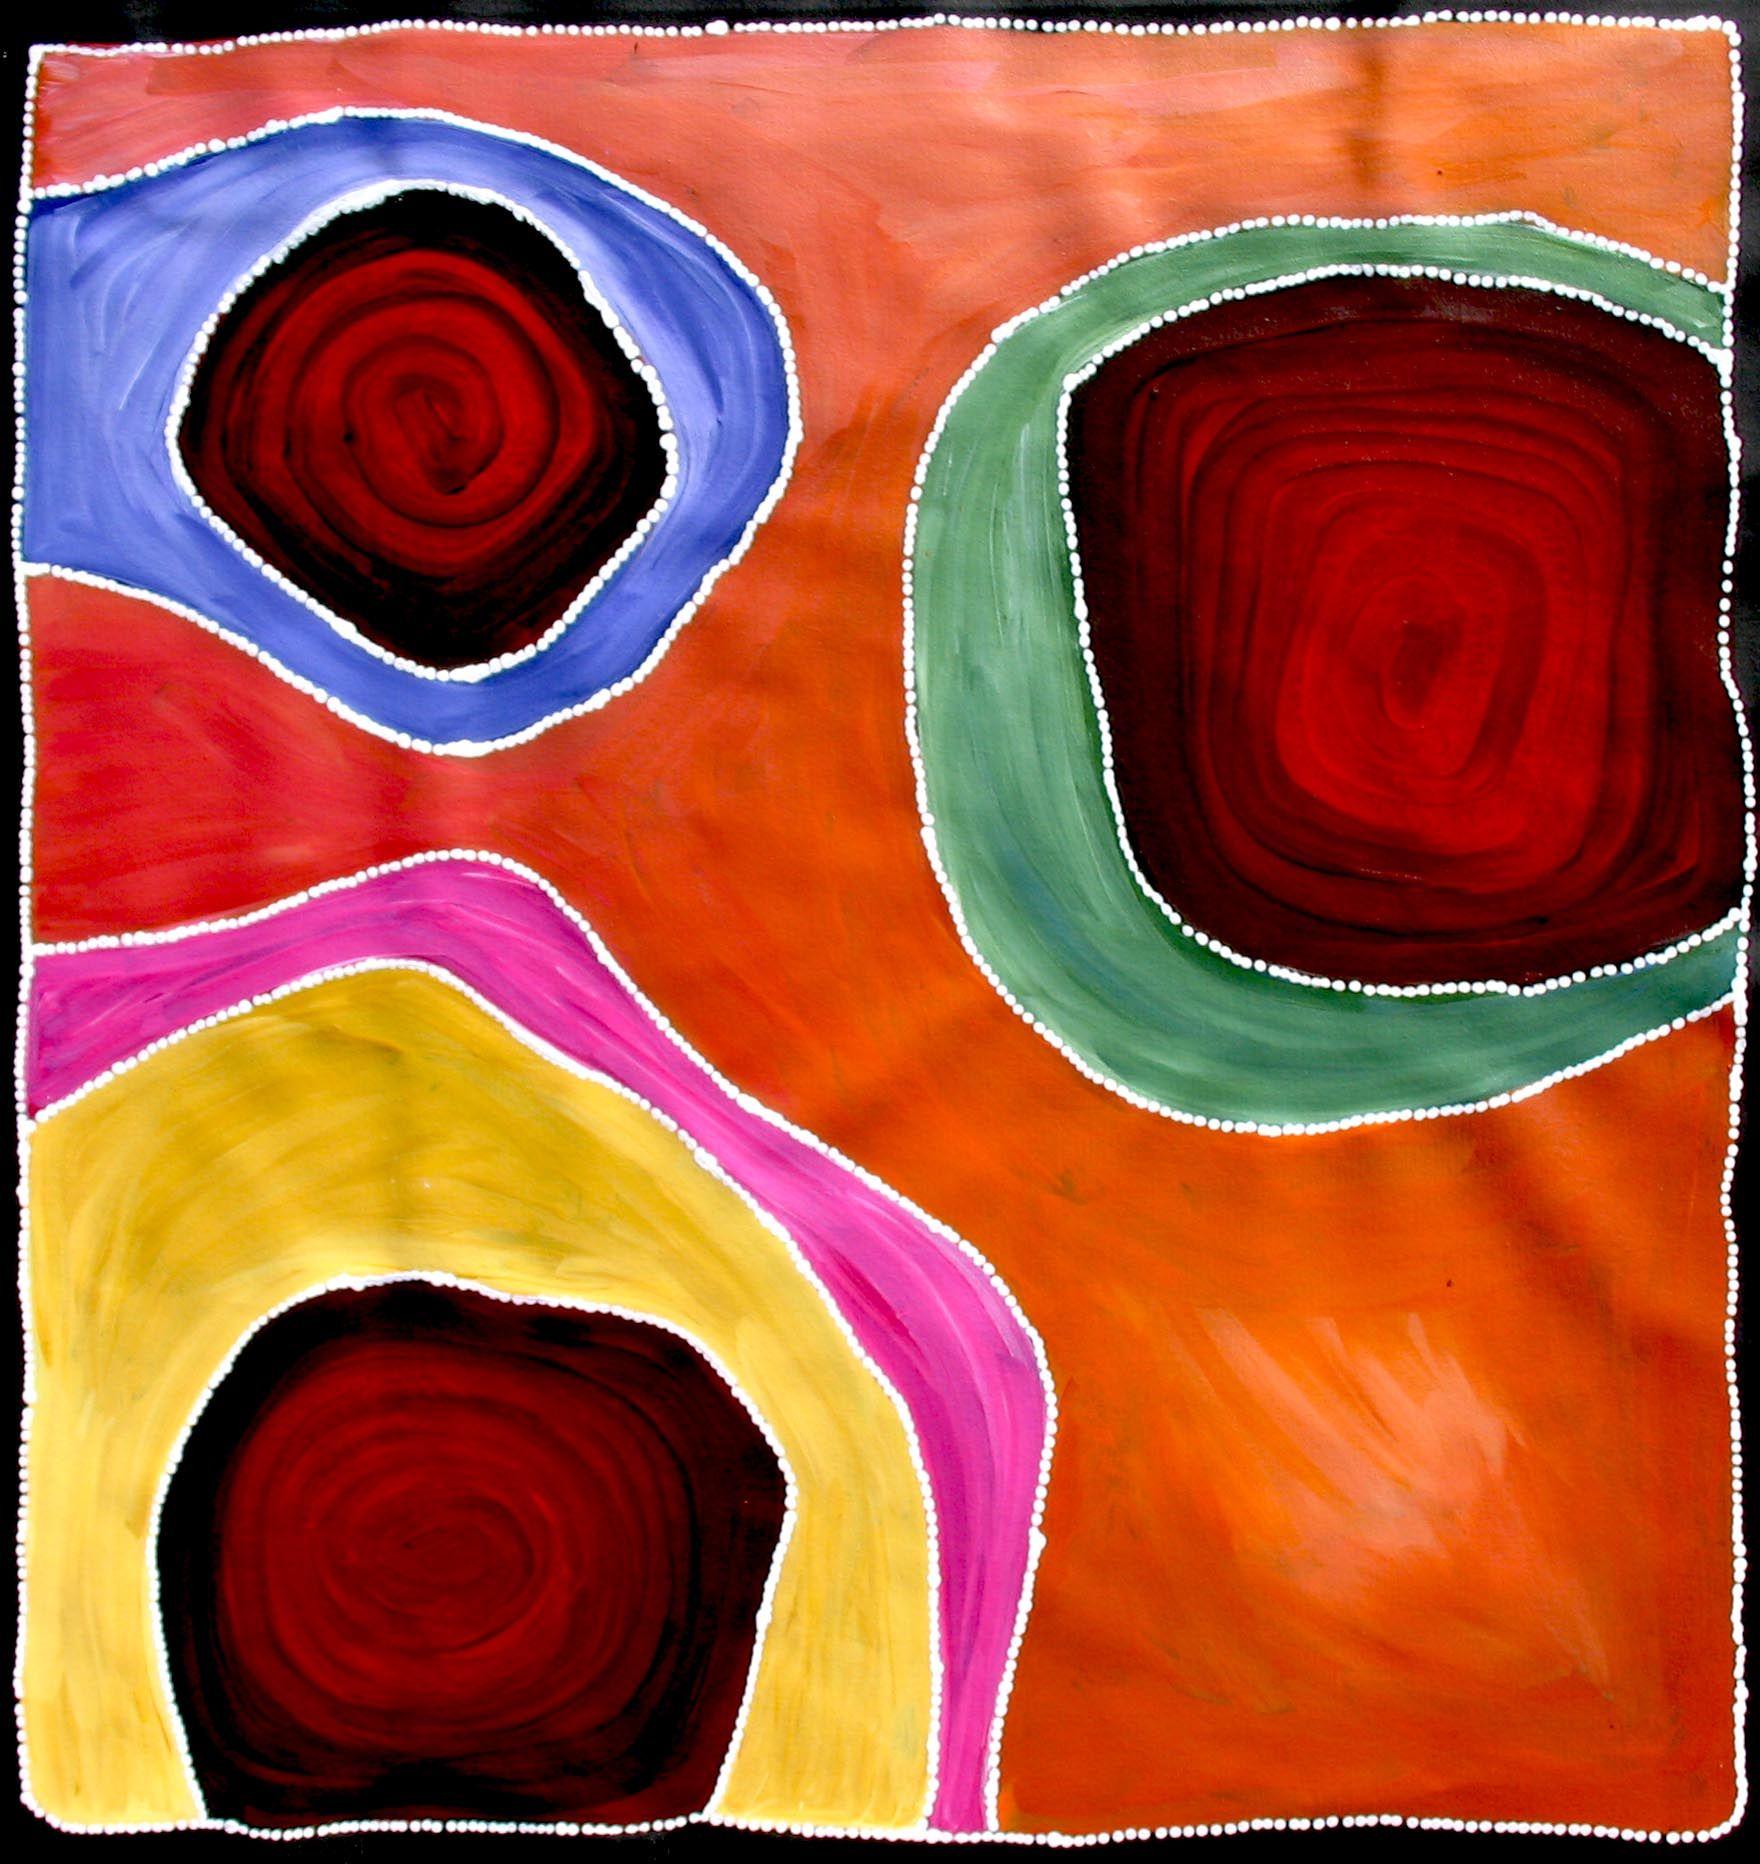 Aboriginal Artwork By Sally Clark Sold Through Coolabah Art On